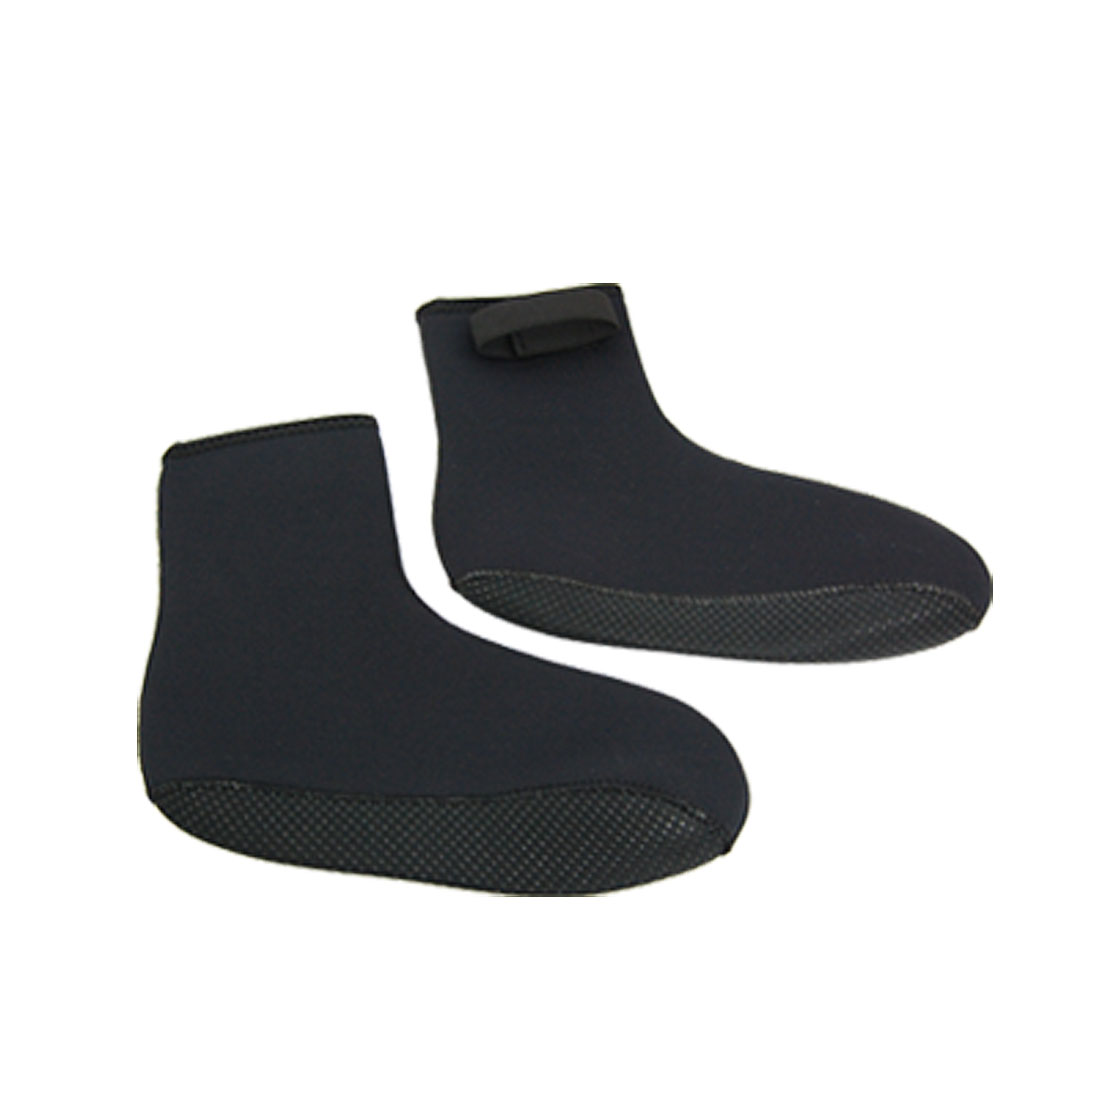 1 Pair Black Elastic Neoprene Diving Boots Diver Socks Boots